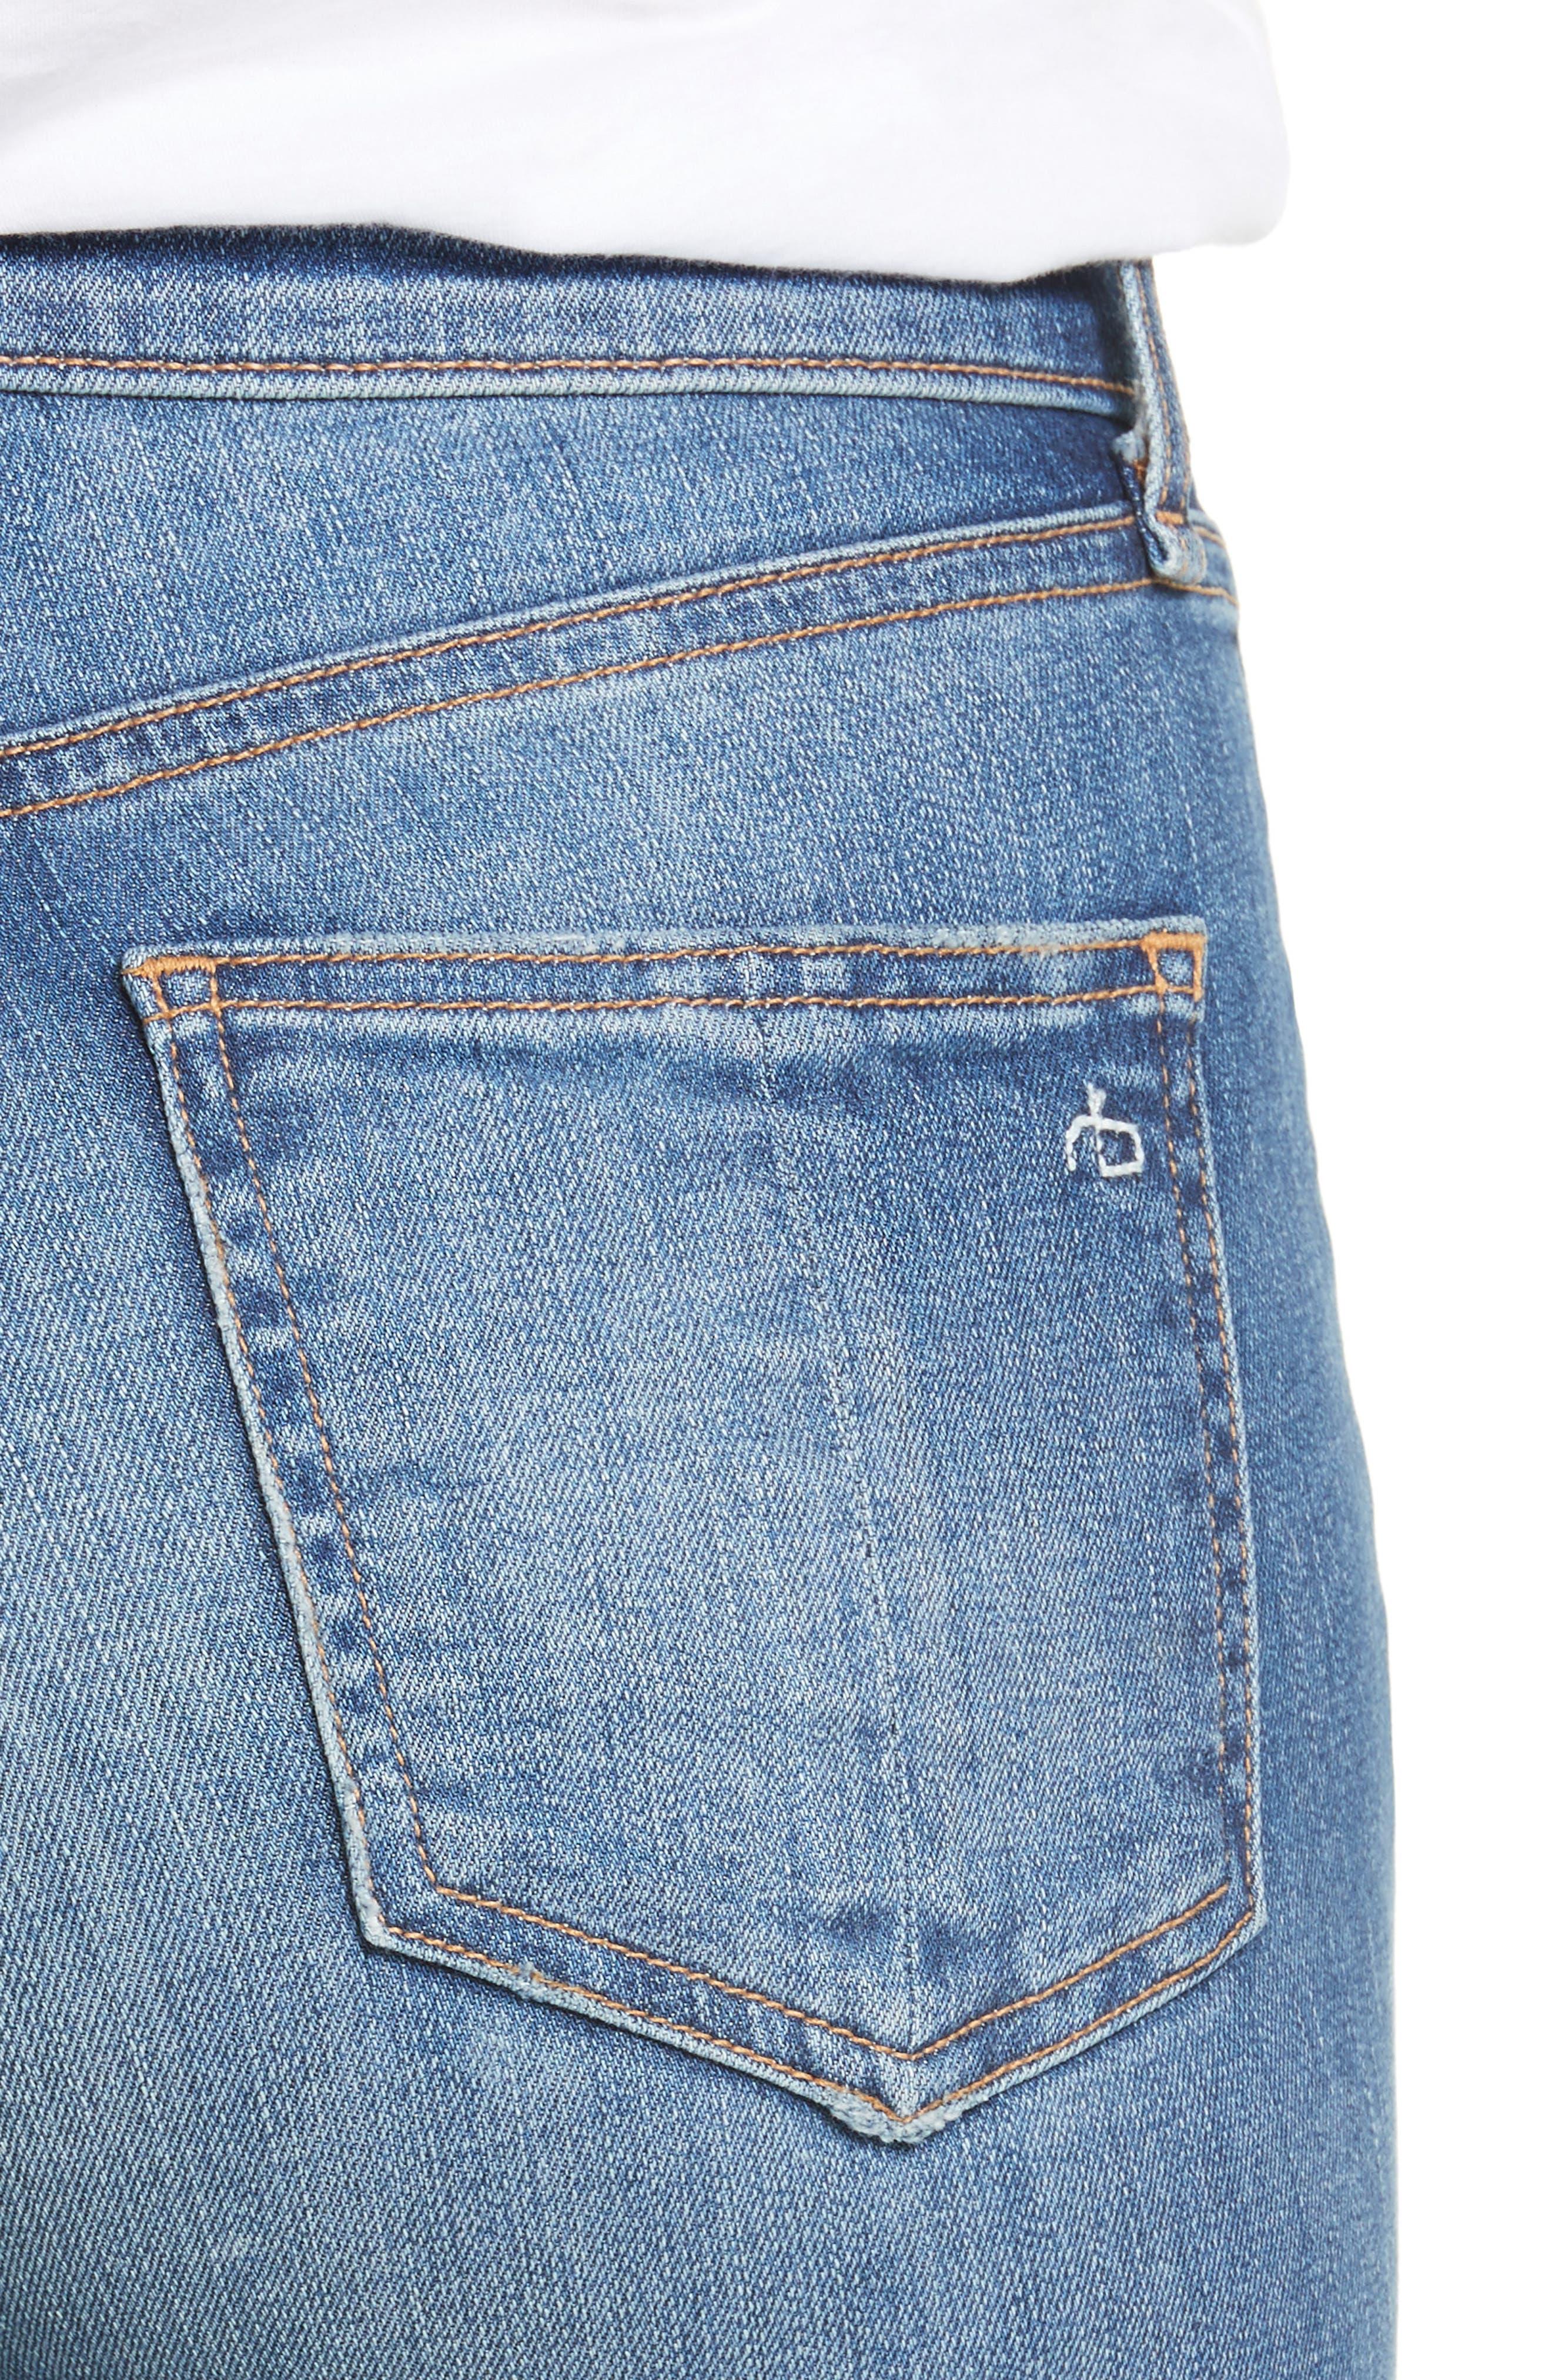 Alternate Image 4  - rag & bone/JEAN Ripped High Waist Skinny Jeans (Bonnie)